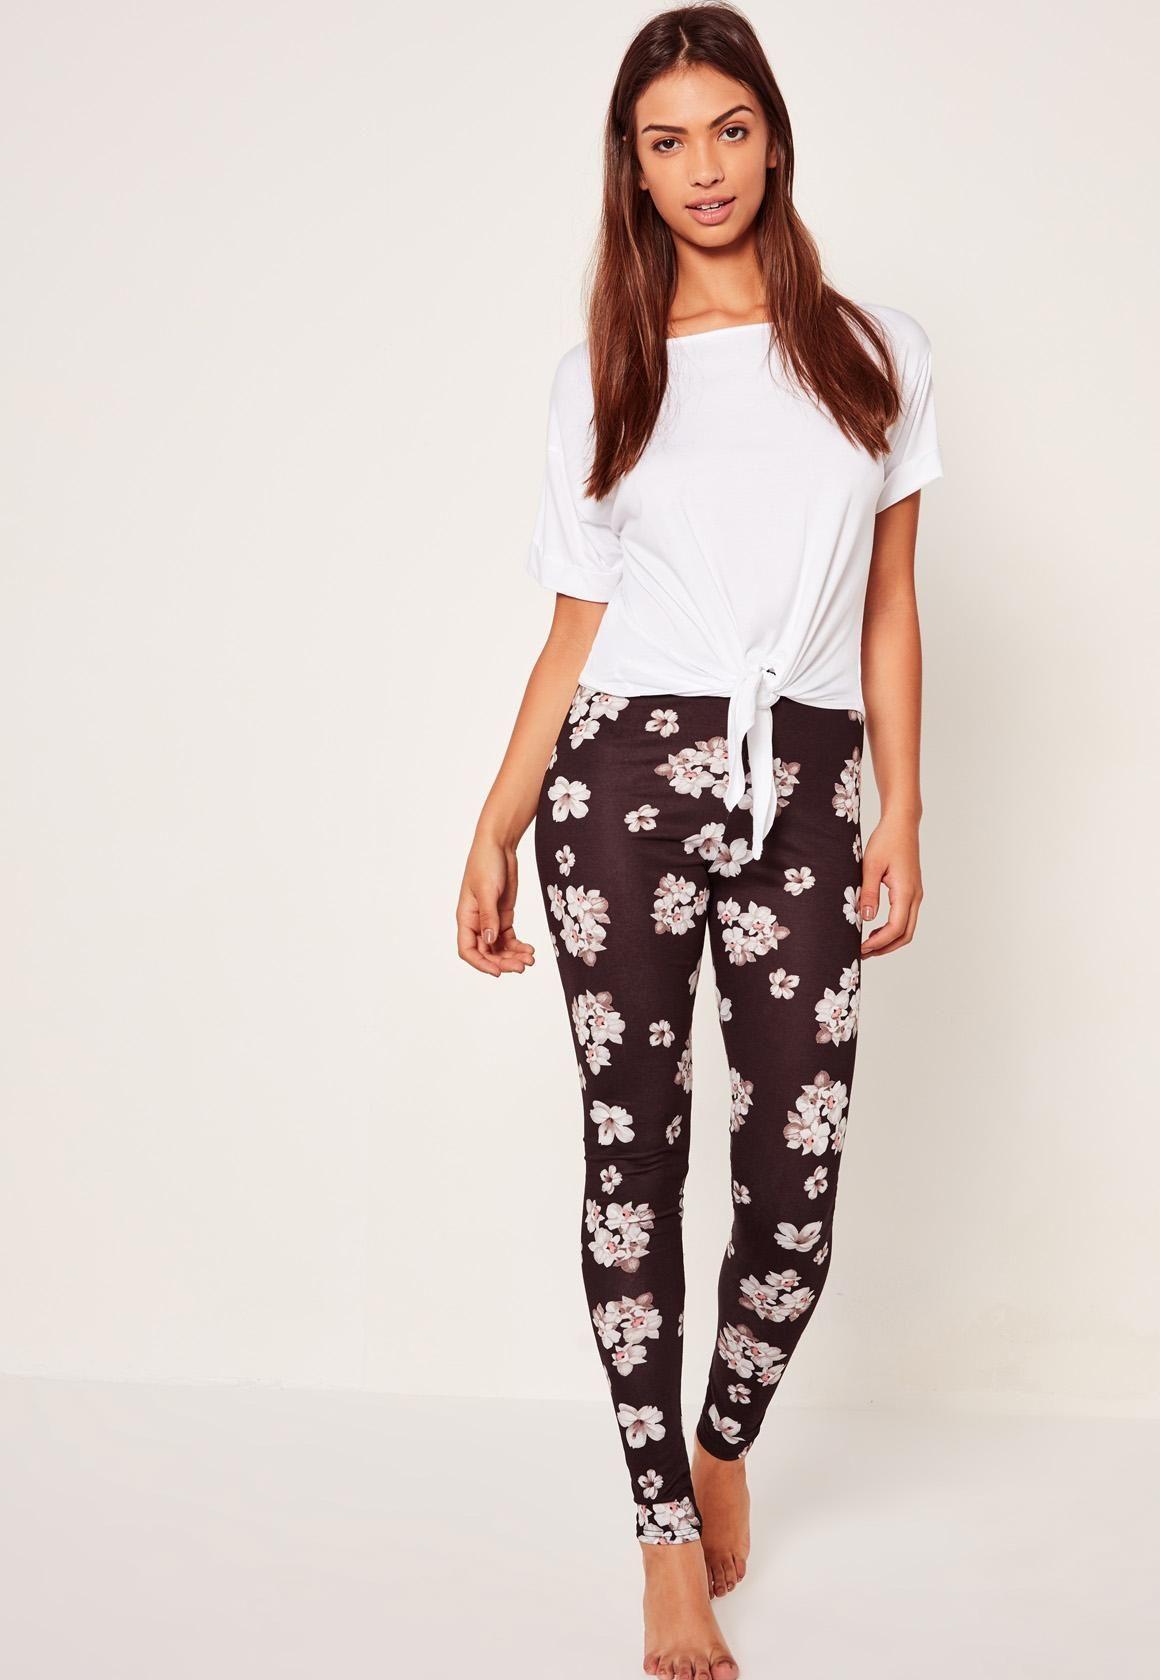 Missguided - Floral Print Legging Pj Set